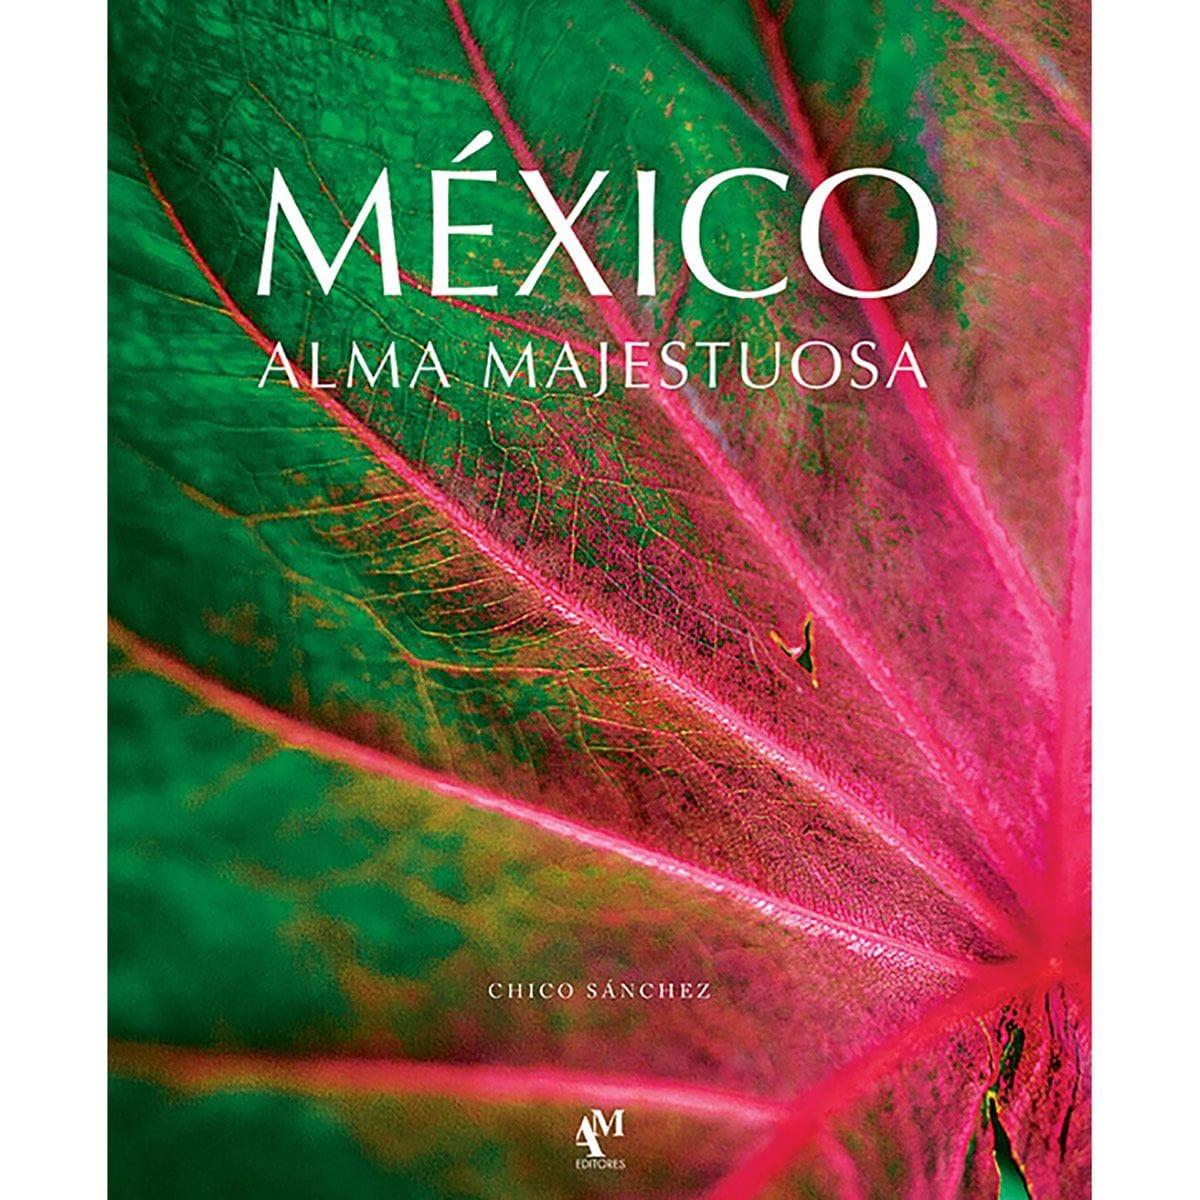 México, alma majestuosa